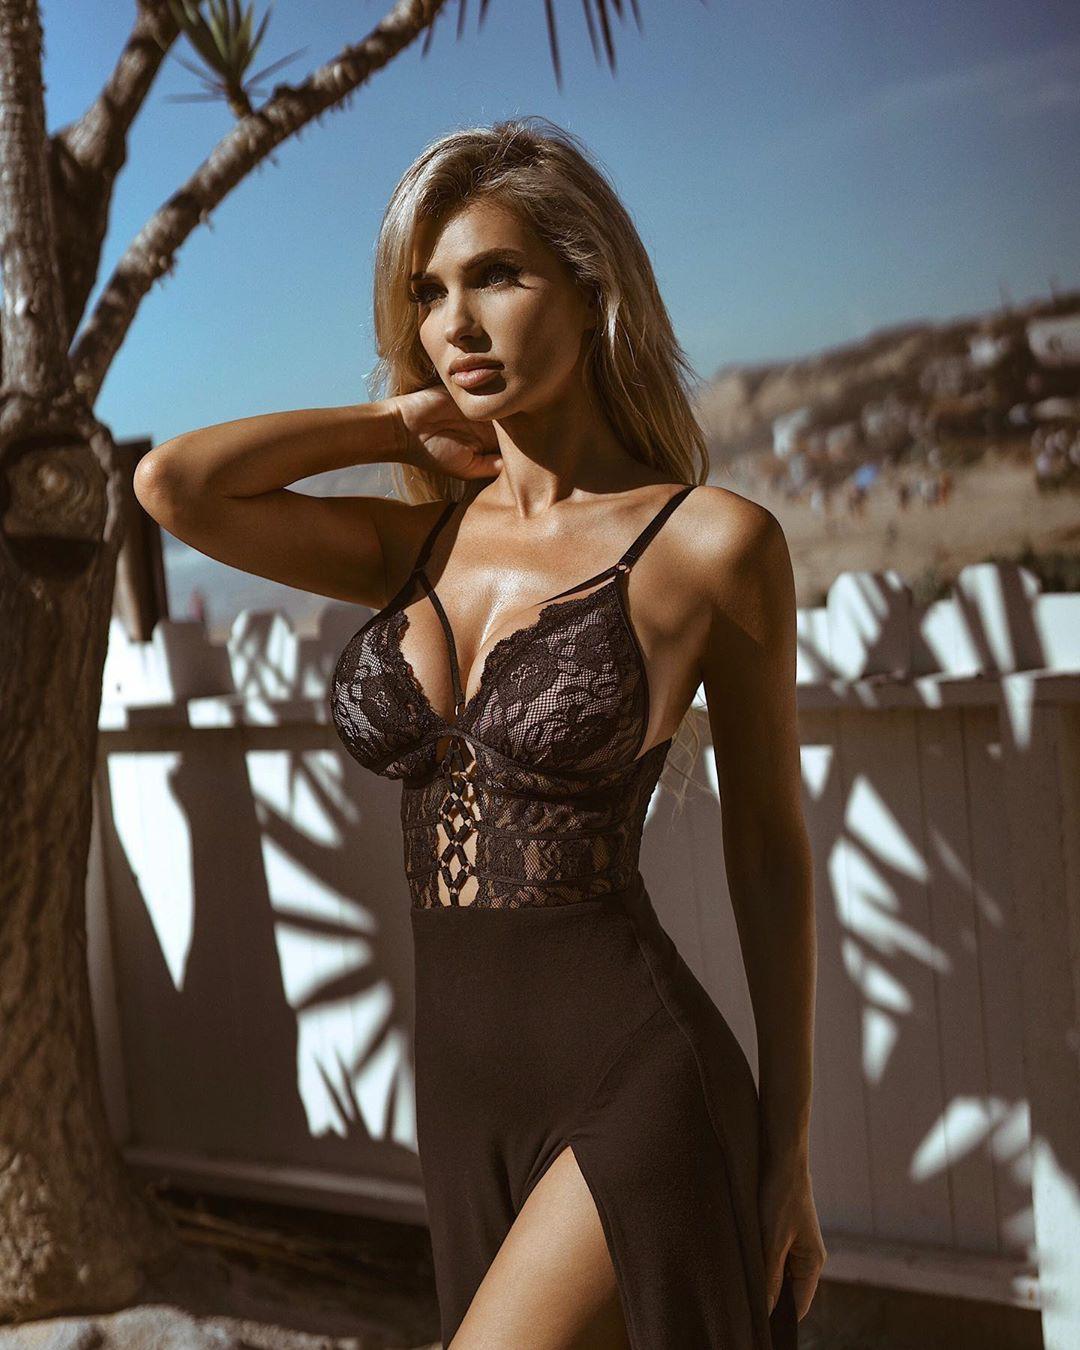 Leanna Bartlett lingerie, dress colour outfit, photoshoot poses